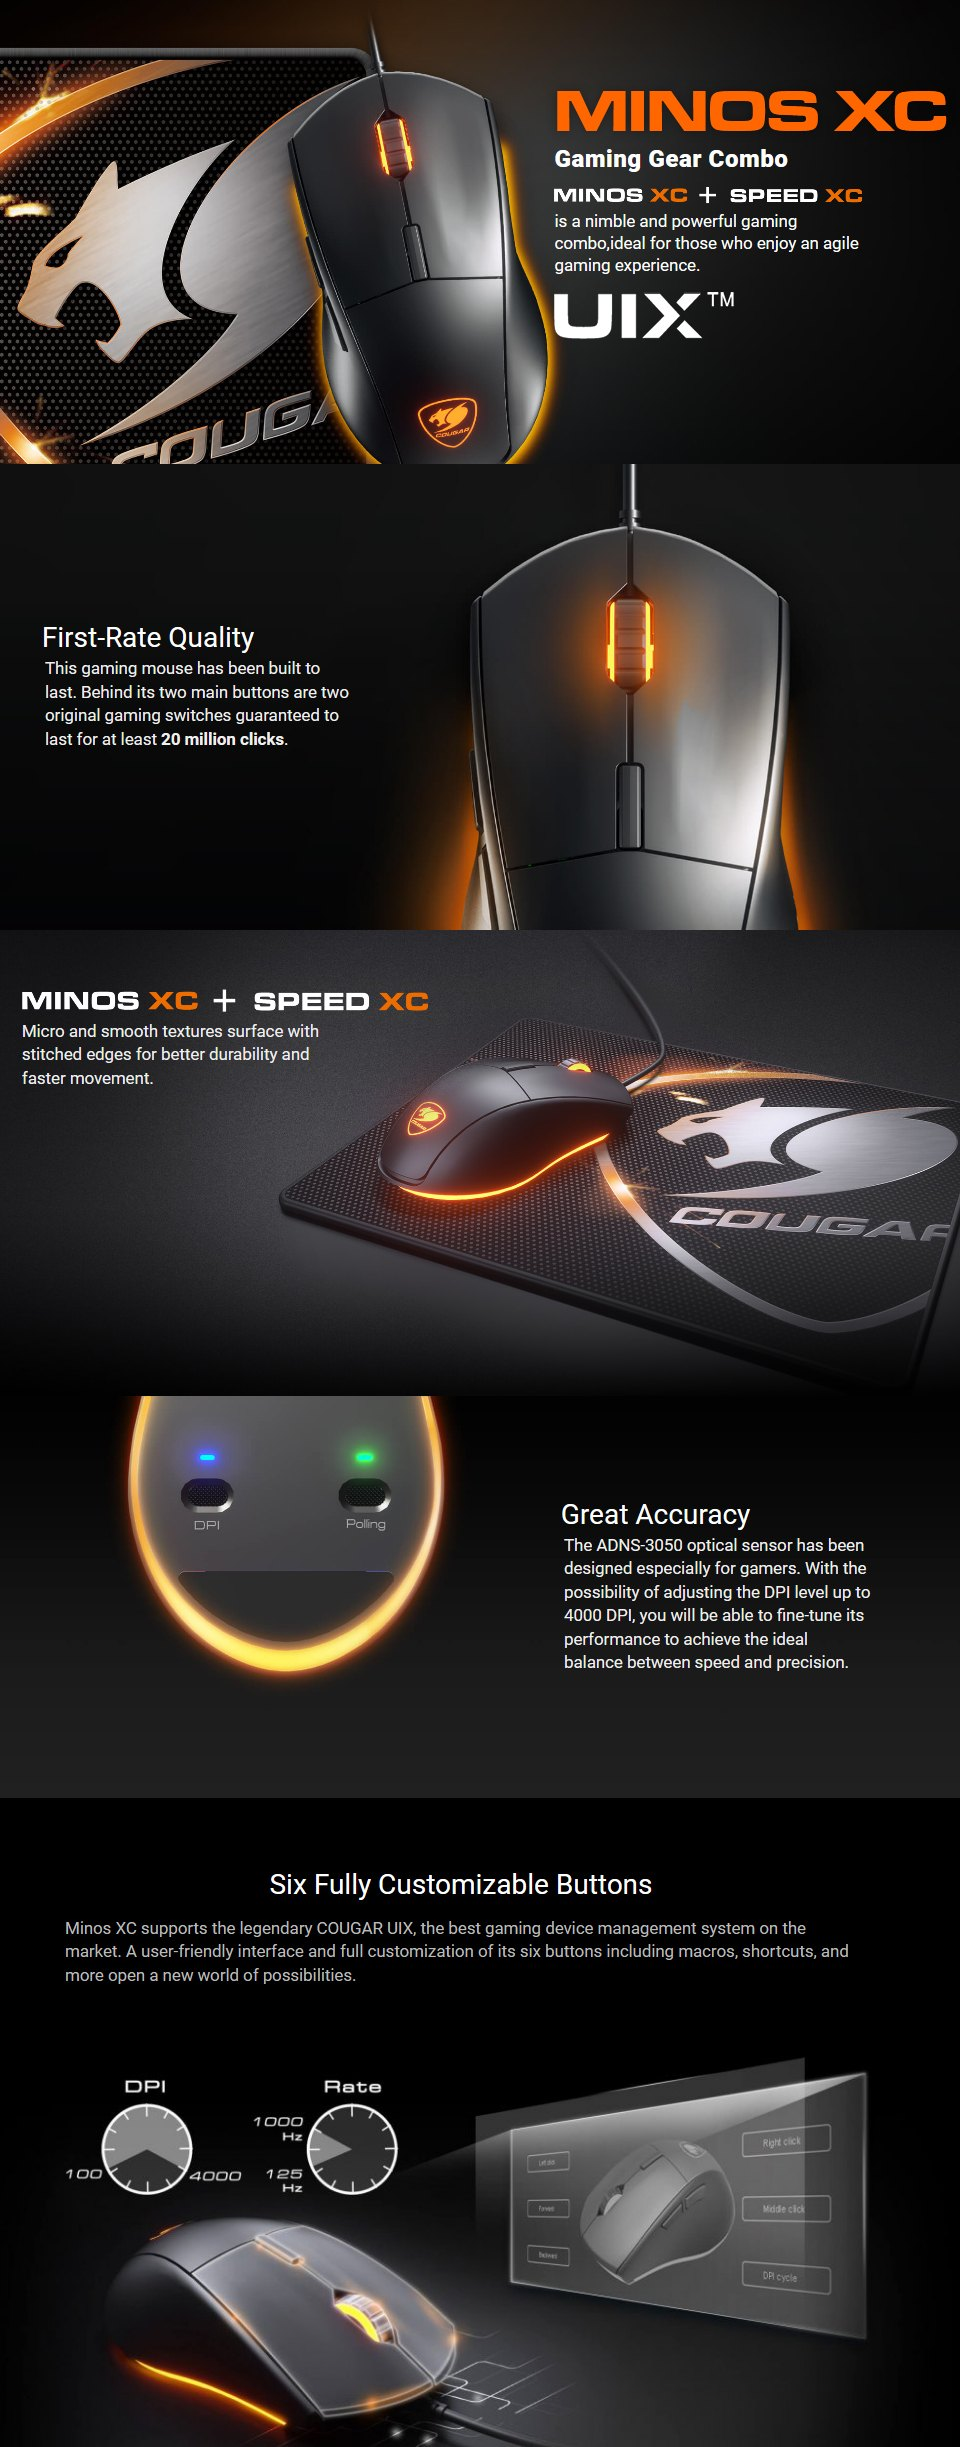 Courgar Minos XC & Speed XC Bundle features